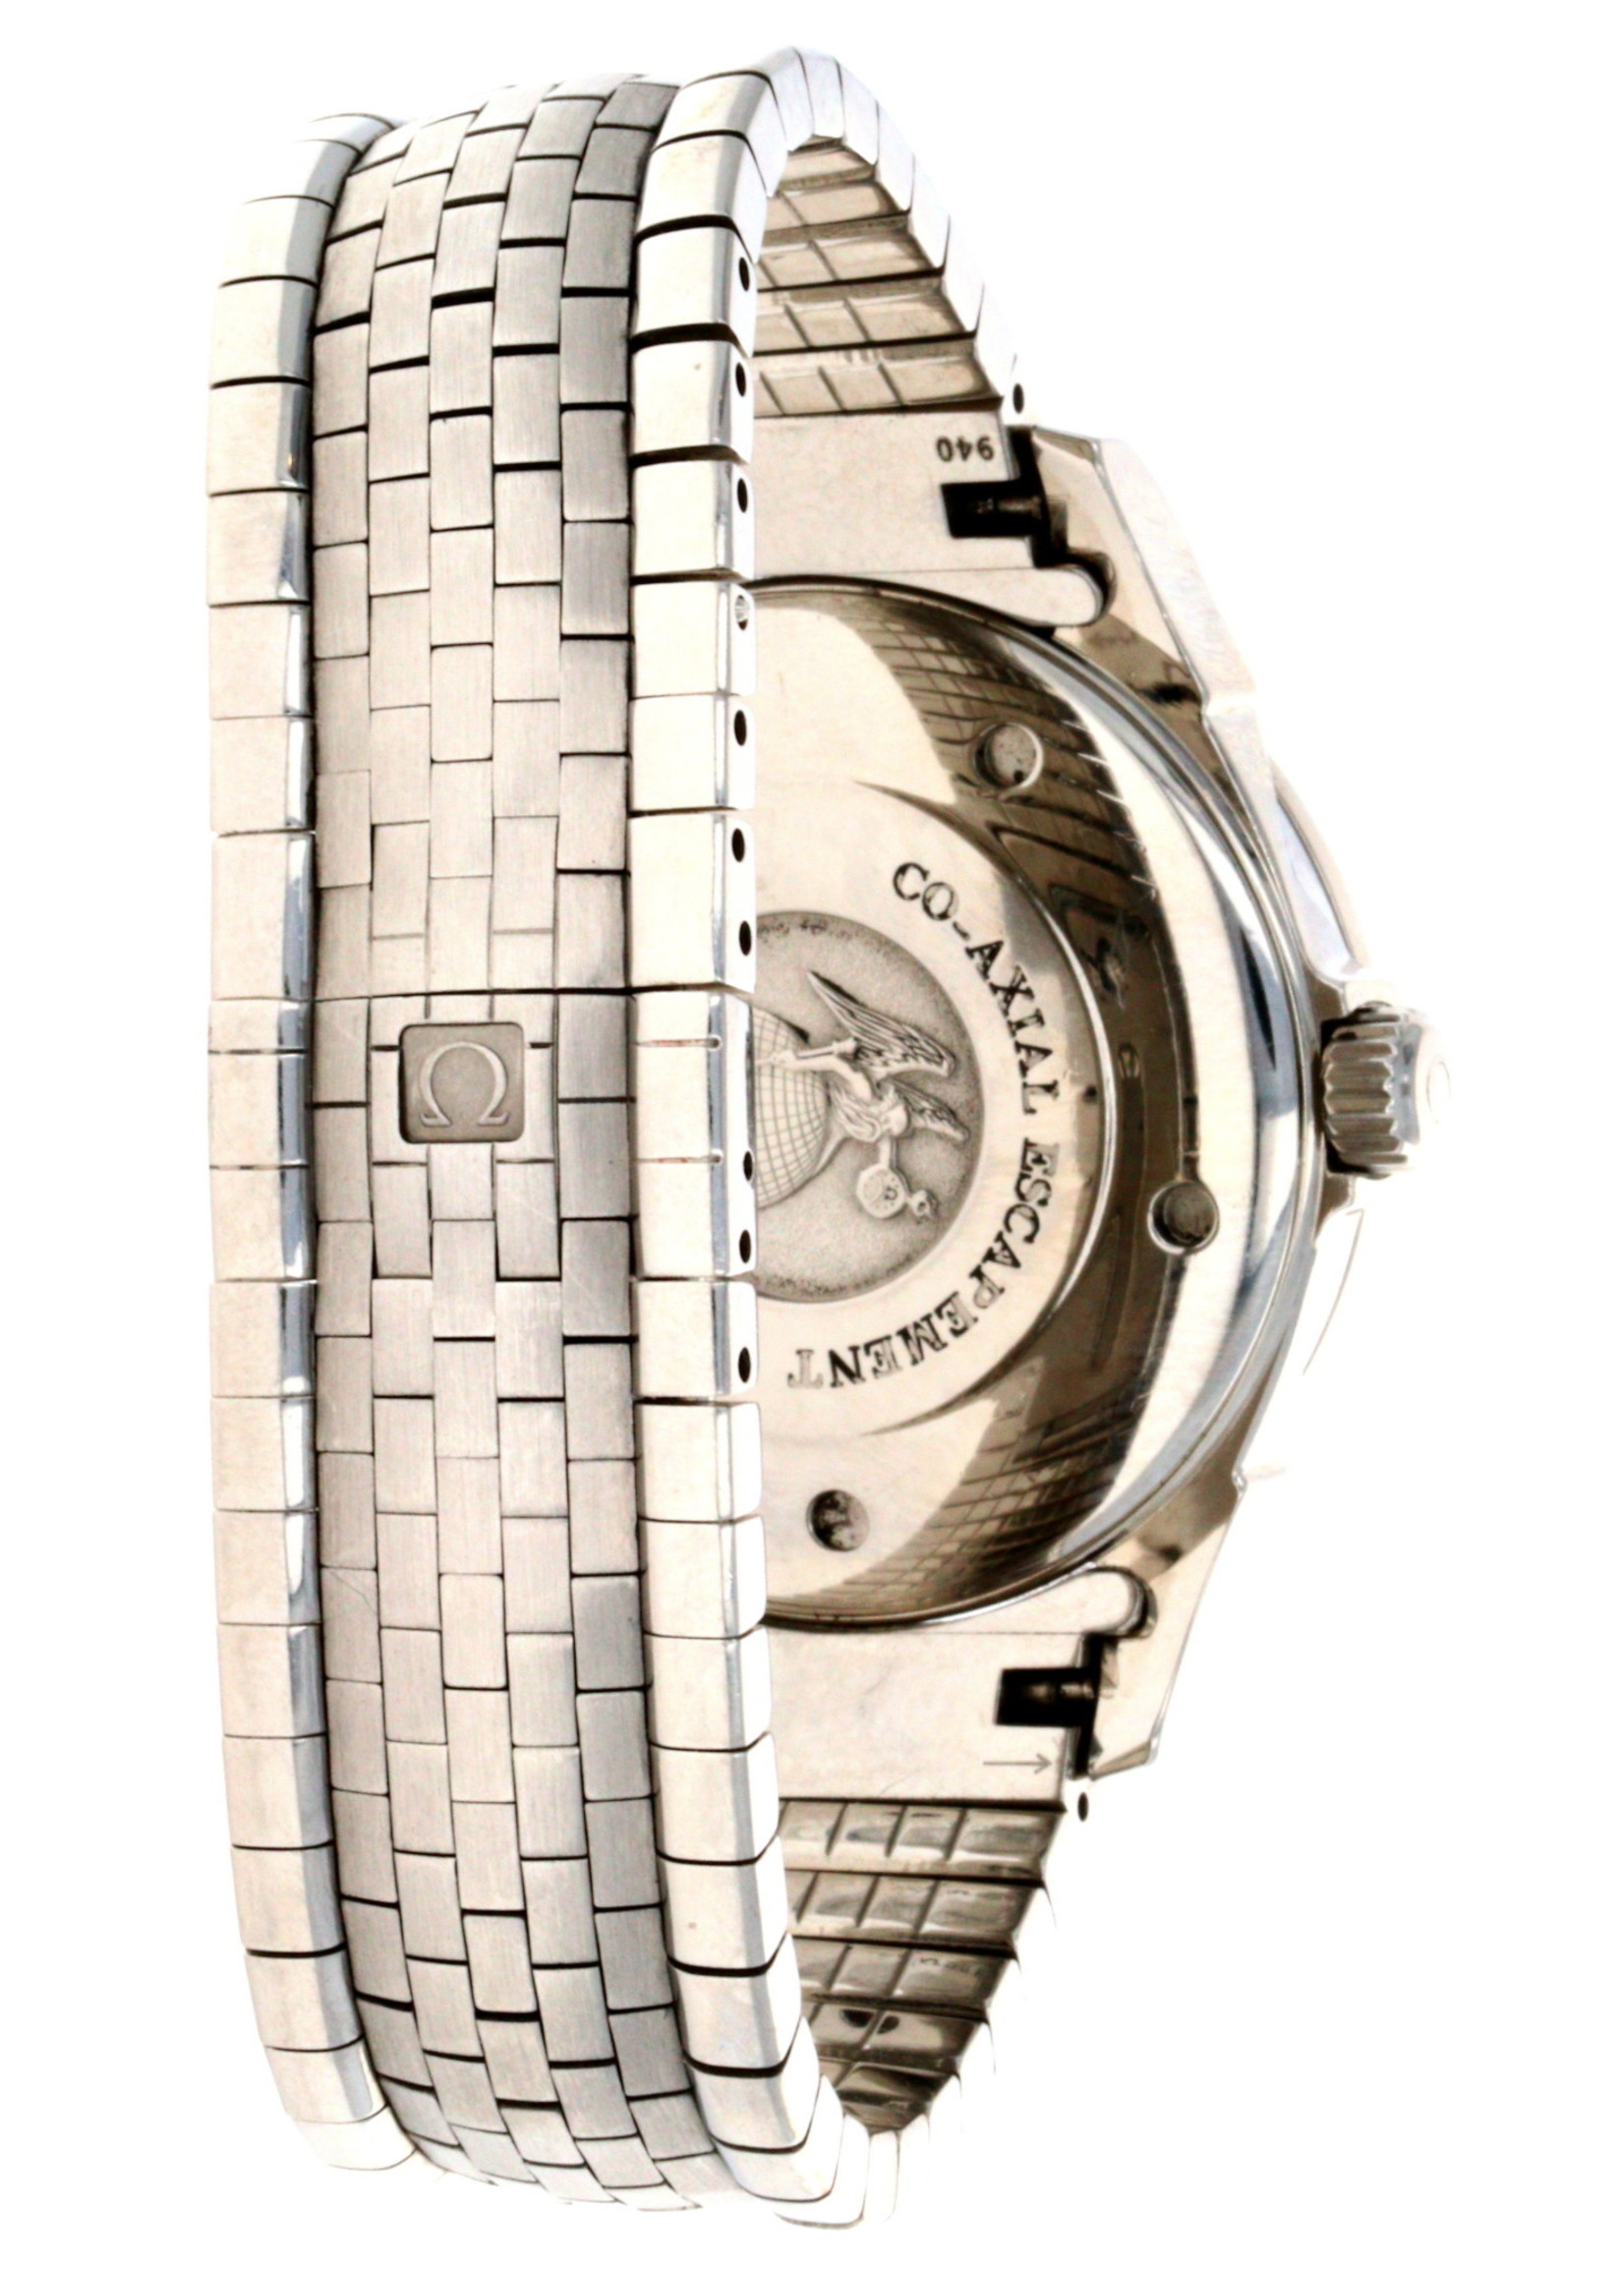 Omega Watches OMEGA DEVILLE #1681704